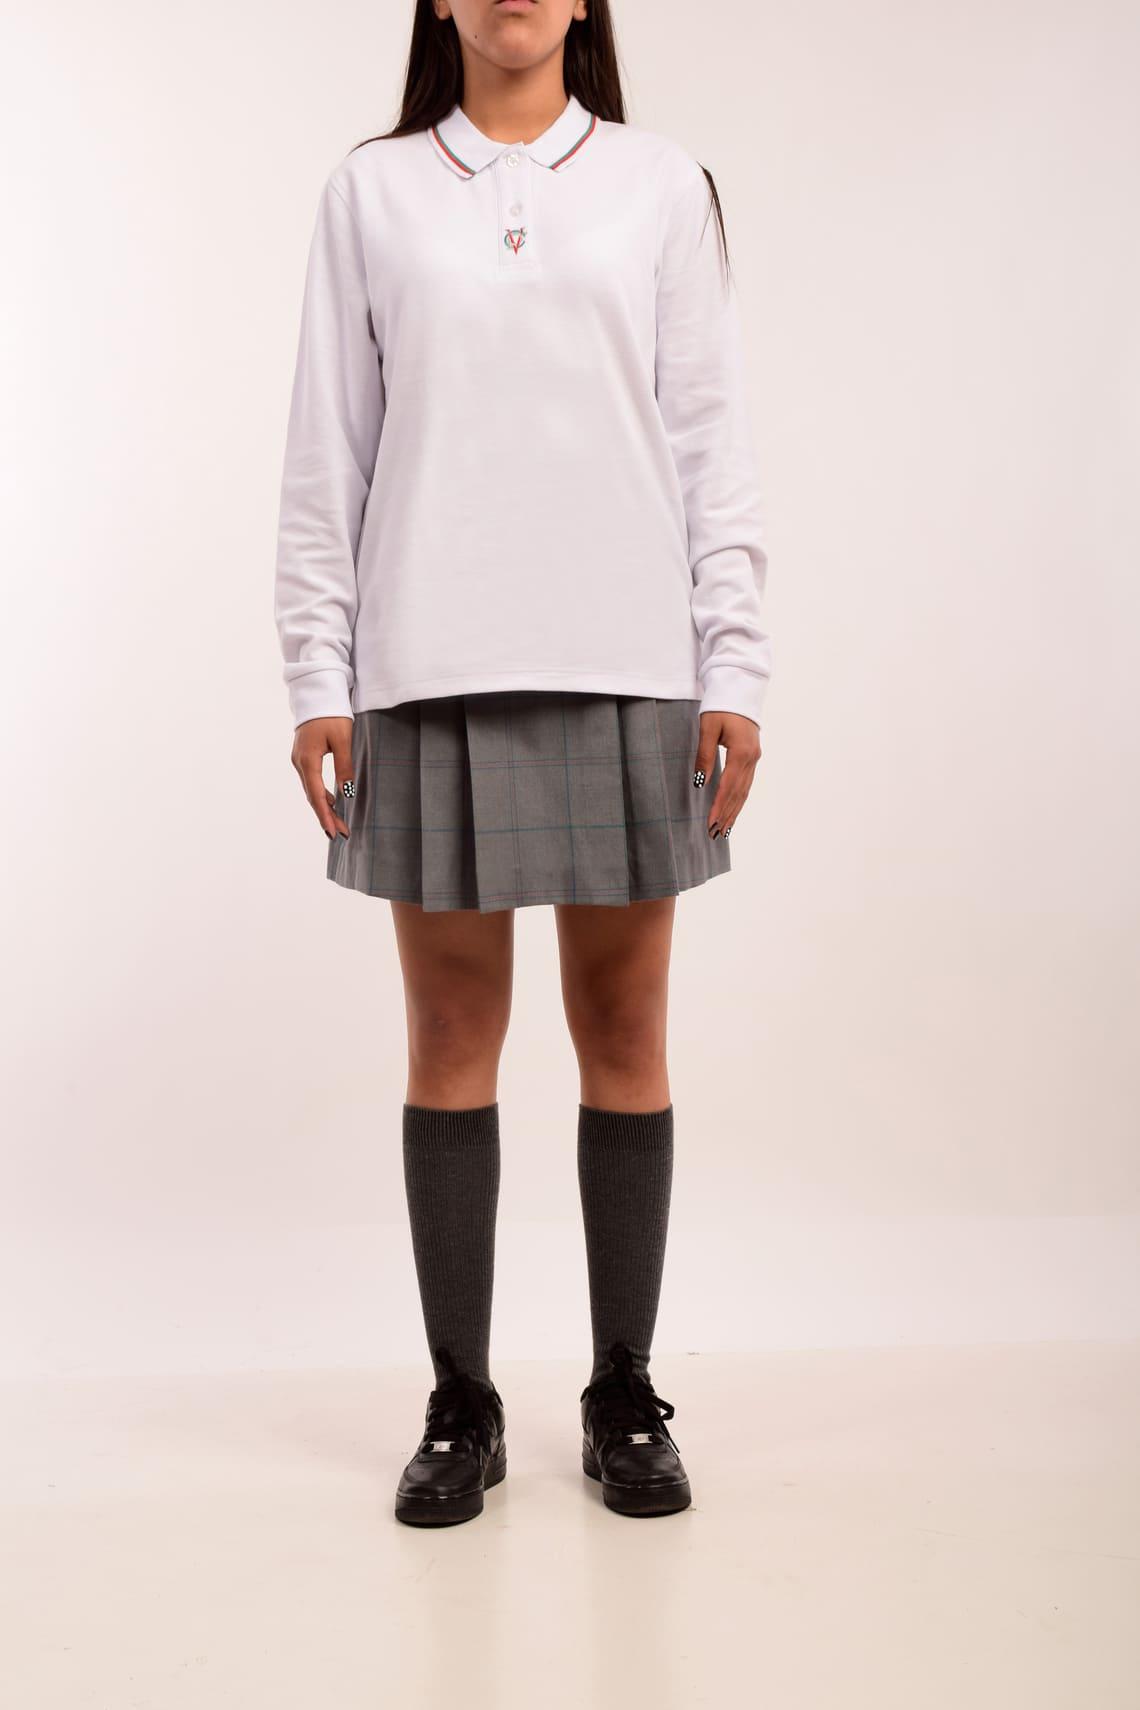 Polera Pique M/L Mujer (S - XL)